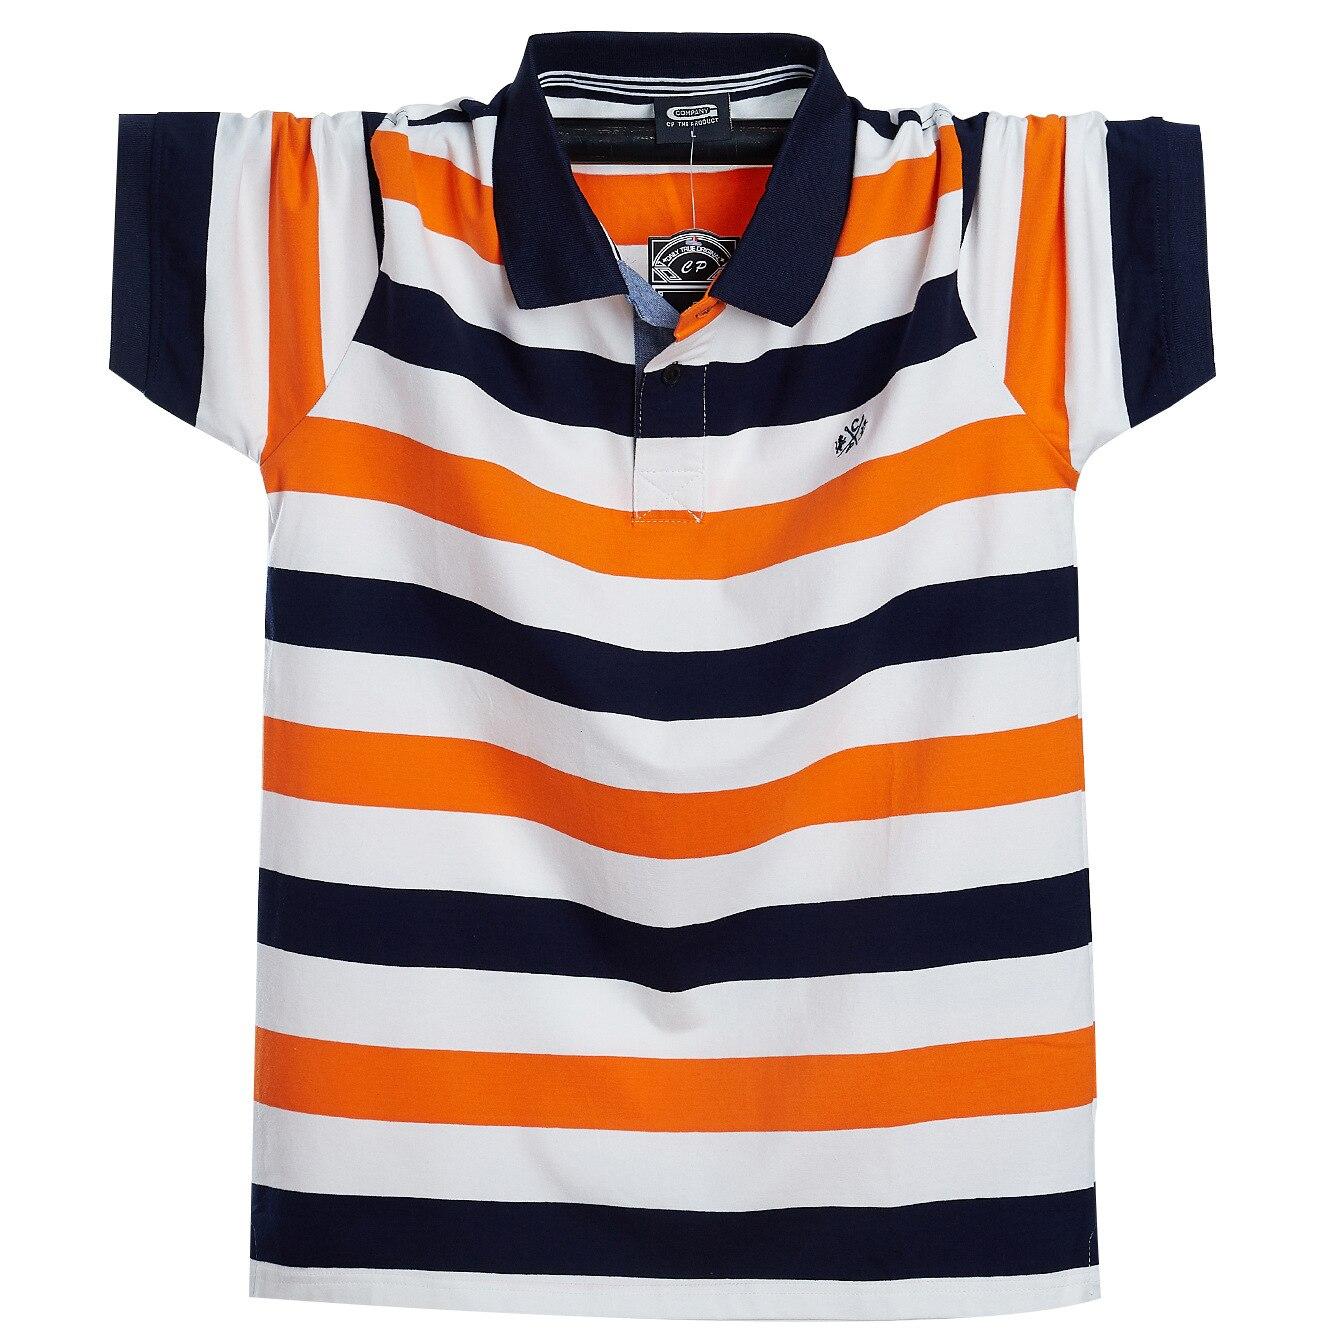 Men Stiped Polo Shirt Plus Size 6xl 7xl 8xl New Summer Brand Men Cotton Striped Polo Men's Homme Camisa Short Sleeves  Shirt